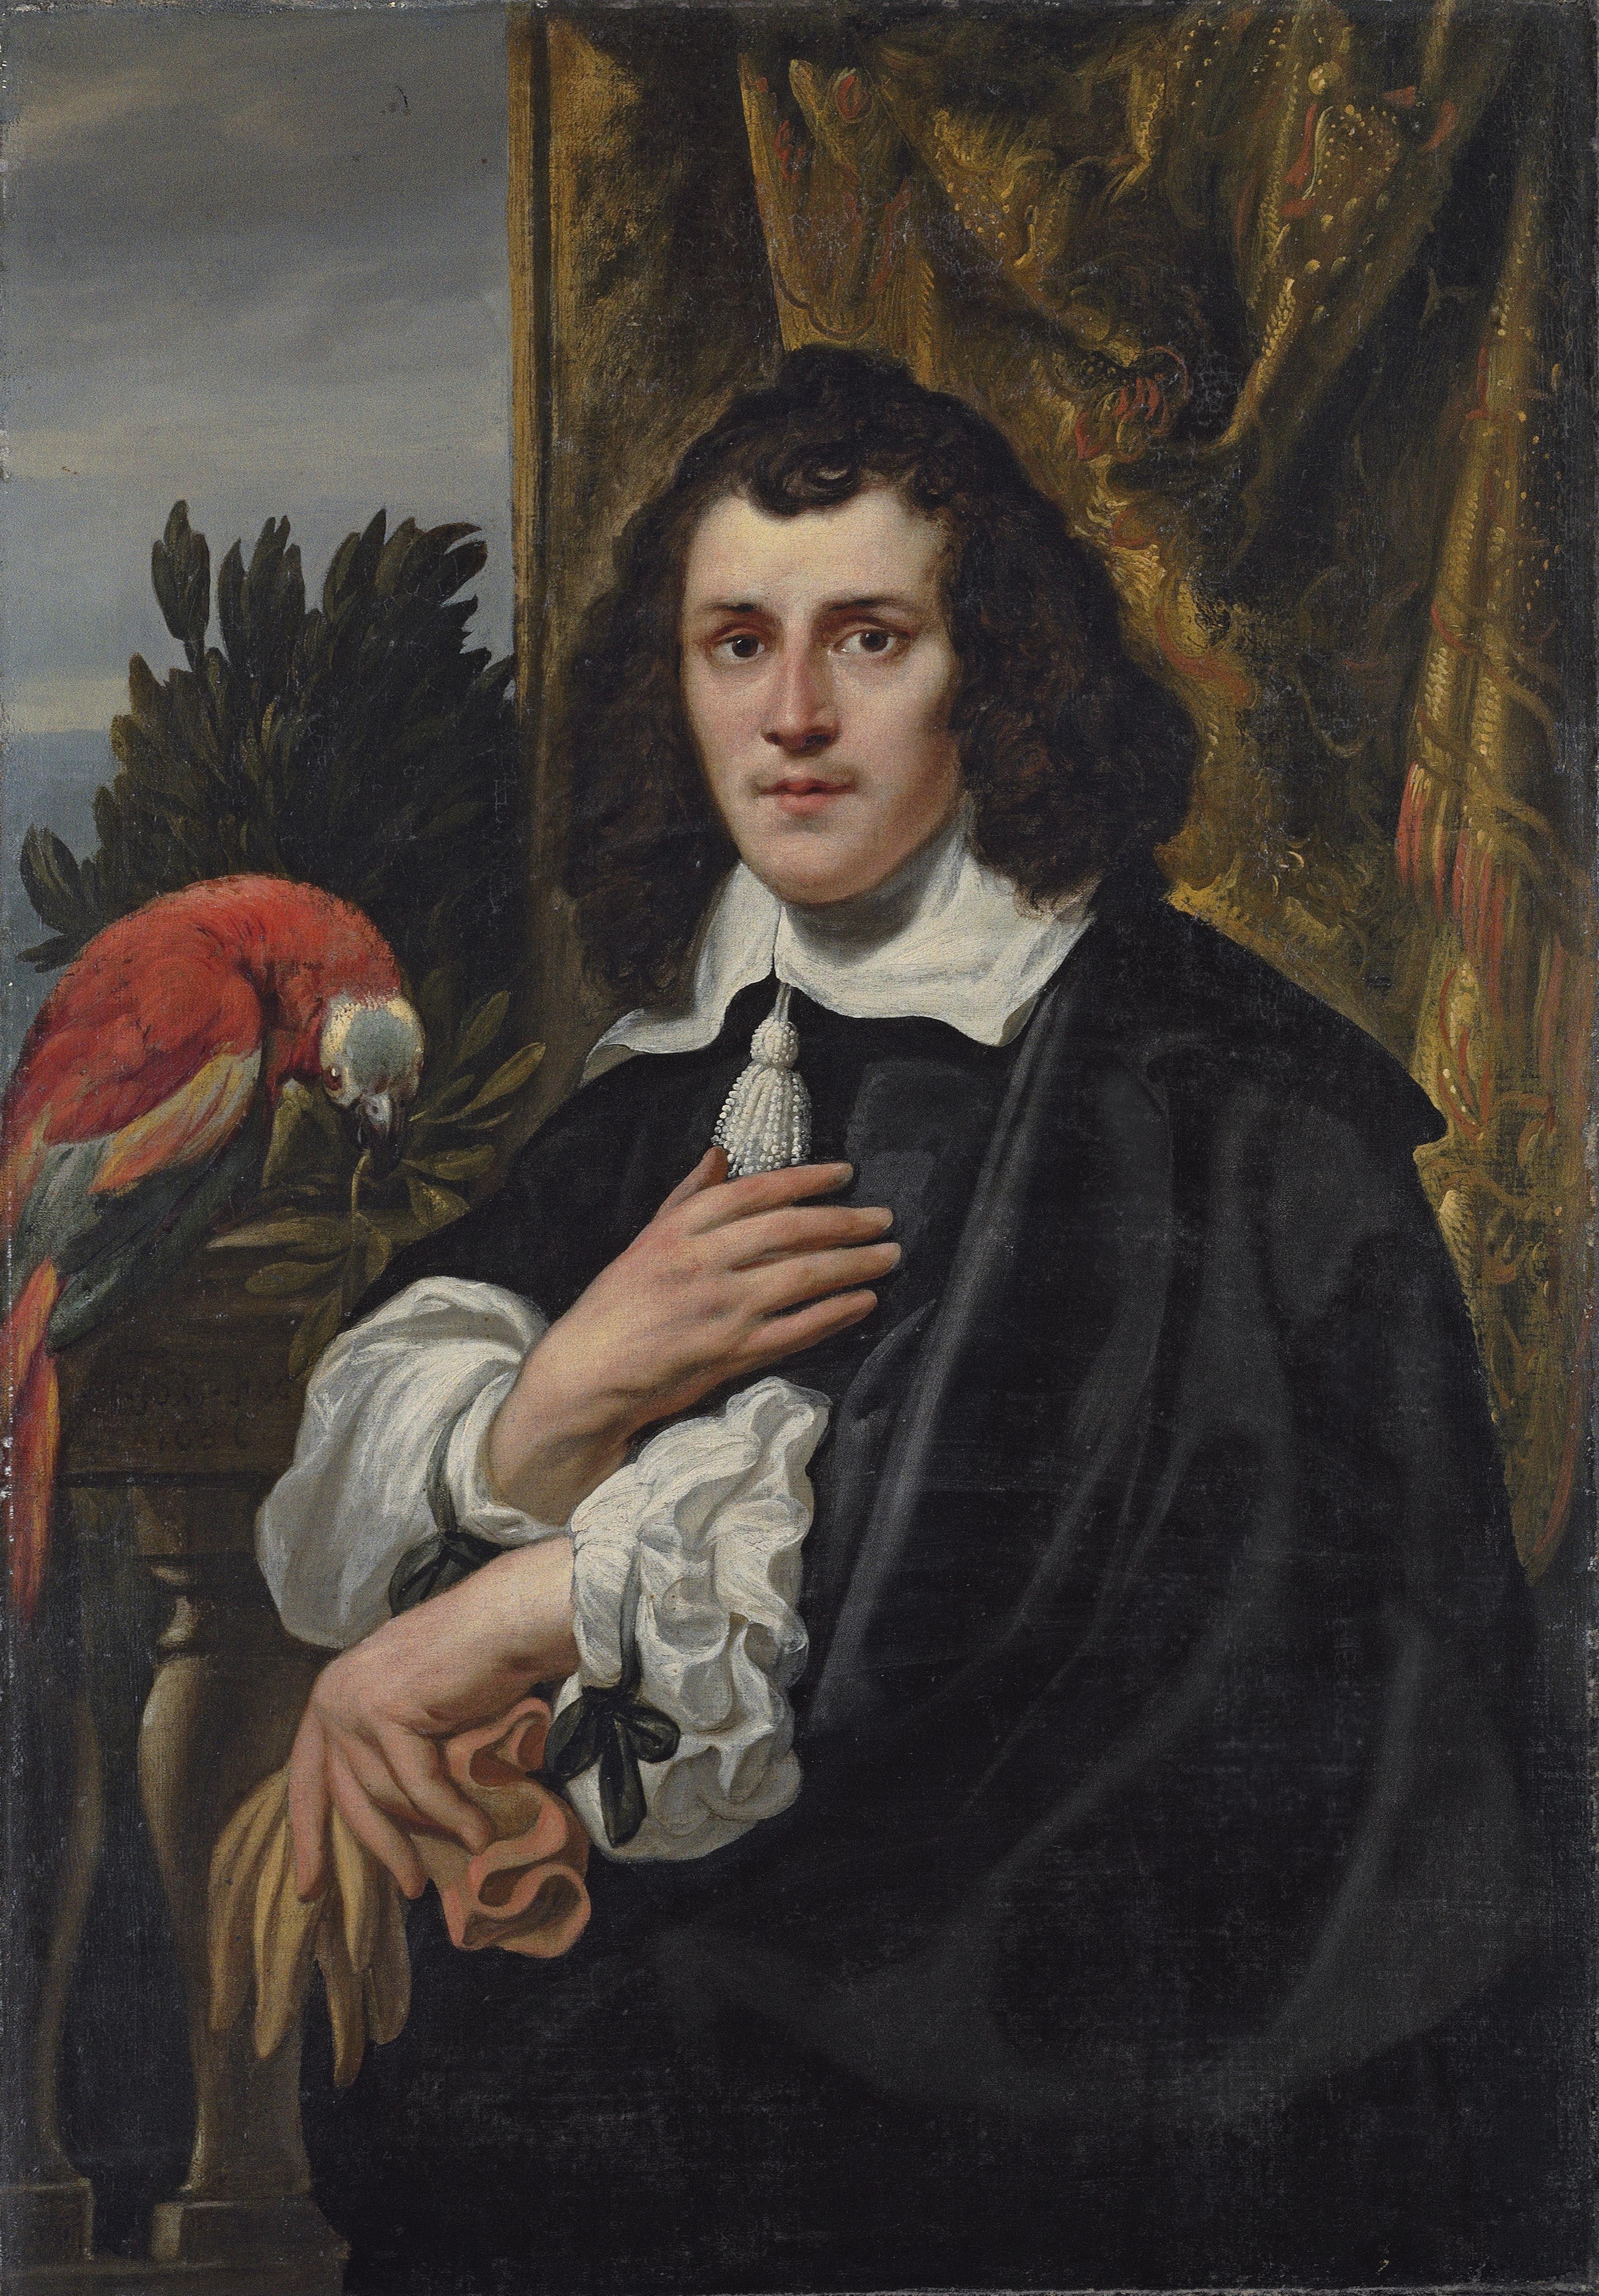 Jacob Jordaens (Antwerp 1593-1